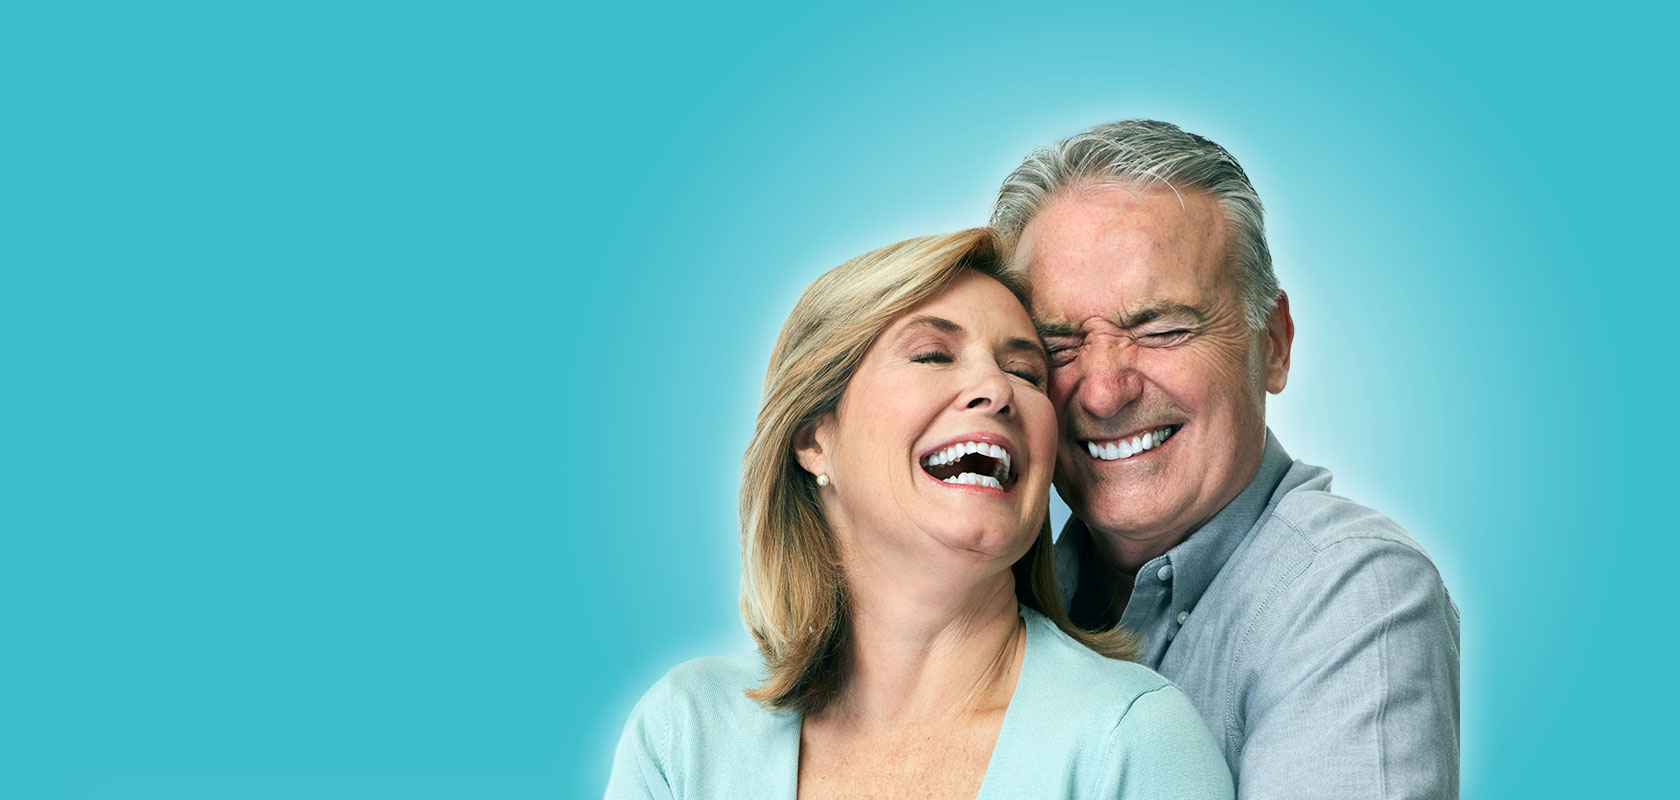 dental implant smiles